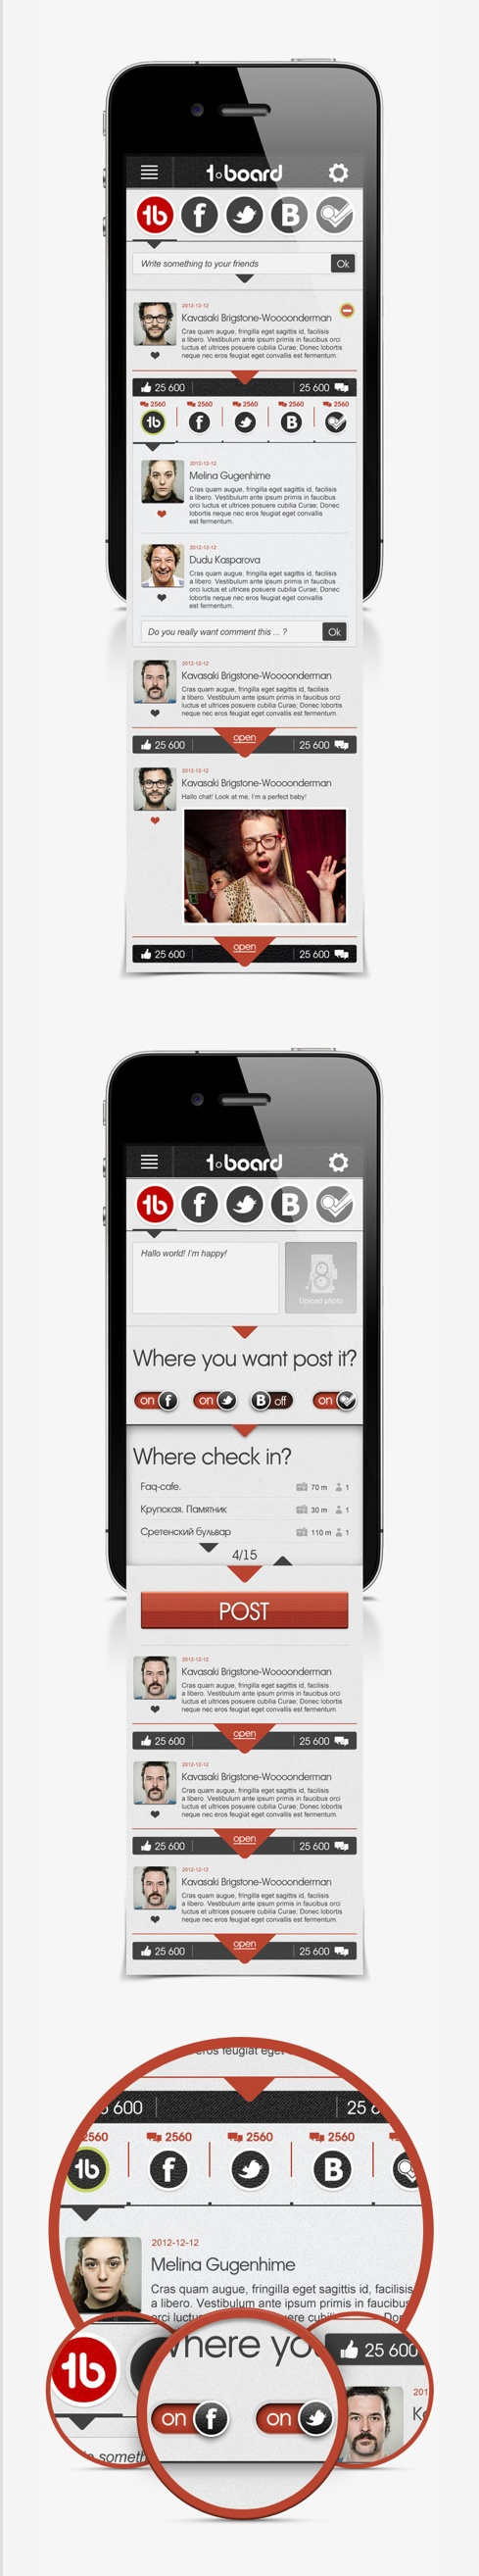 #mobile #ui #behance #digital on #Twitpic